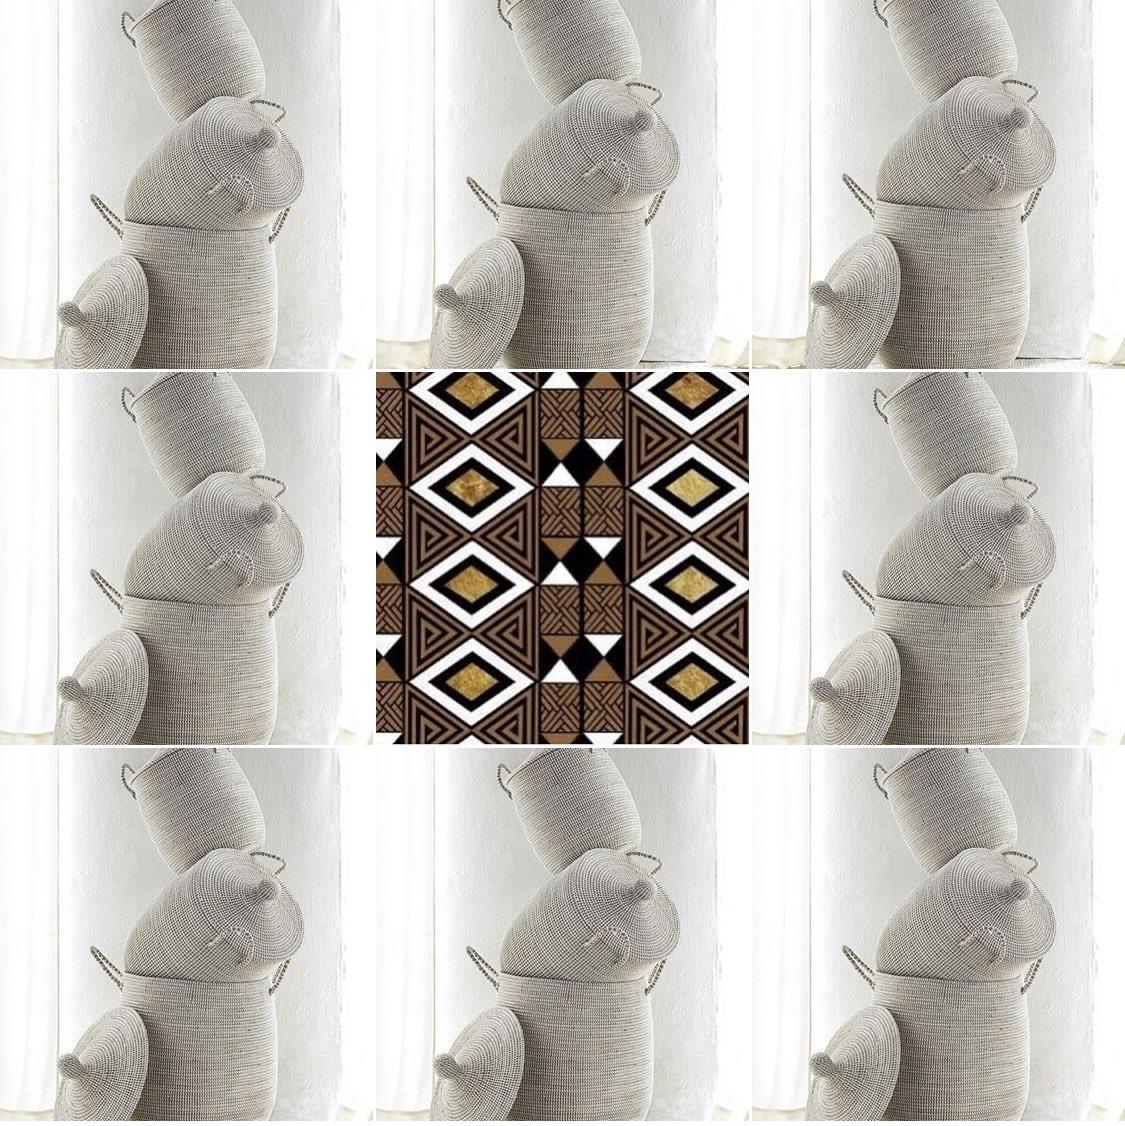 #silksofshebalaunchingsoon #Africa #EnchantingAfrica #silksofsheba #Fashion #AfricanFashion #Ankaraprintsilks https://t.co/UaUHTHgixu